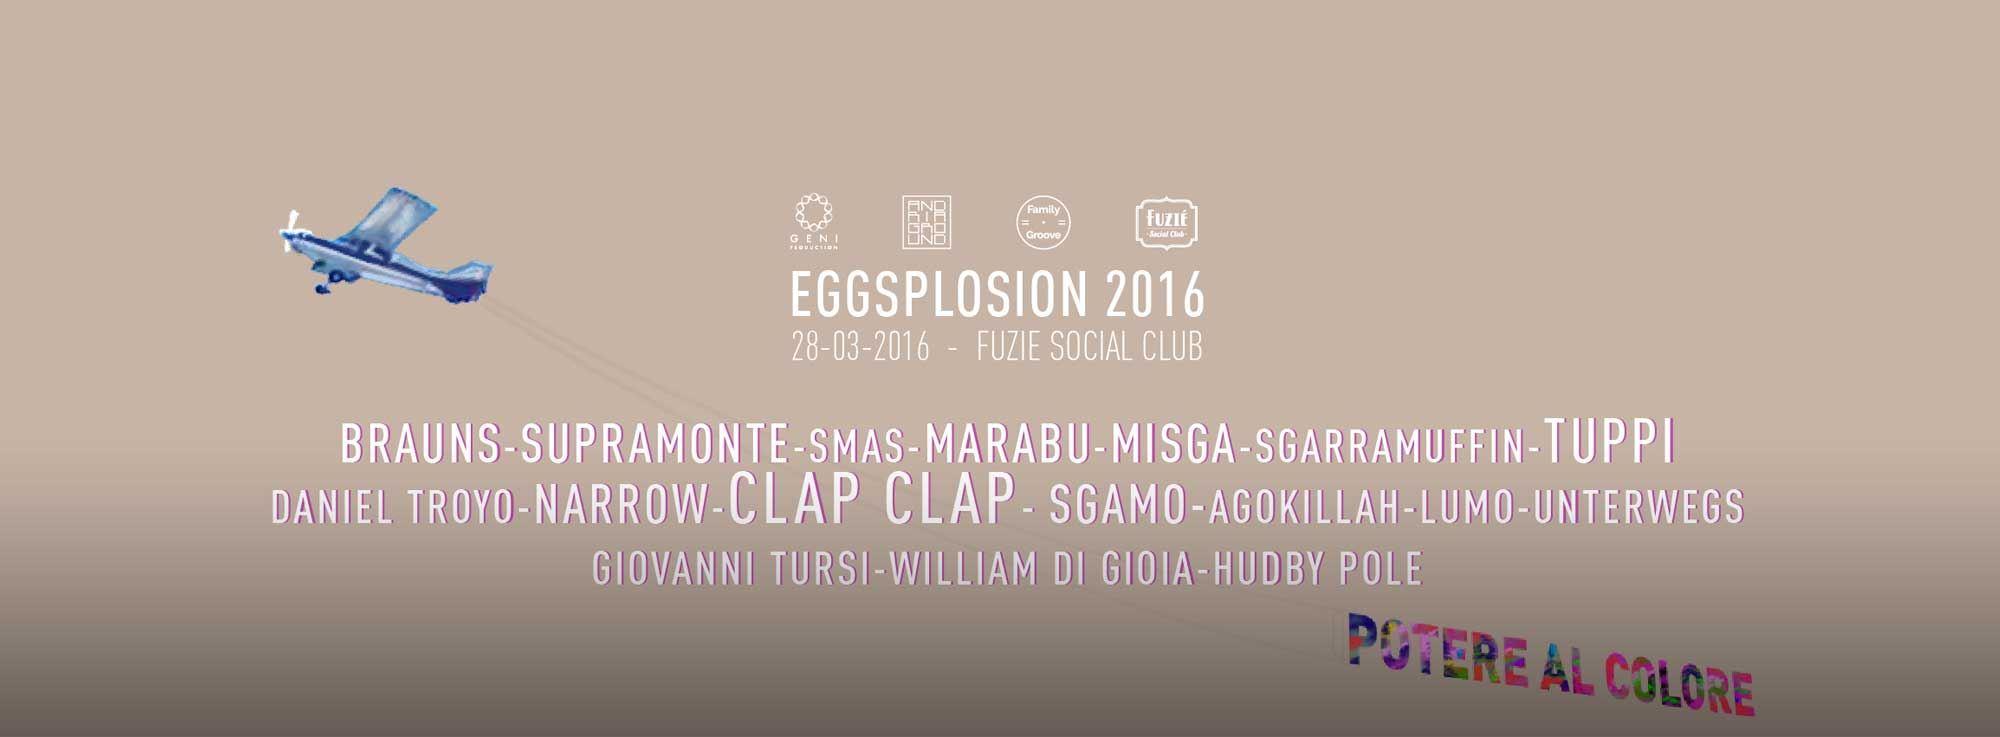 Andria: Eggsplosion 2016